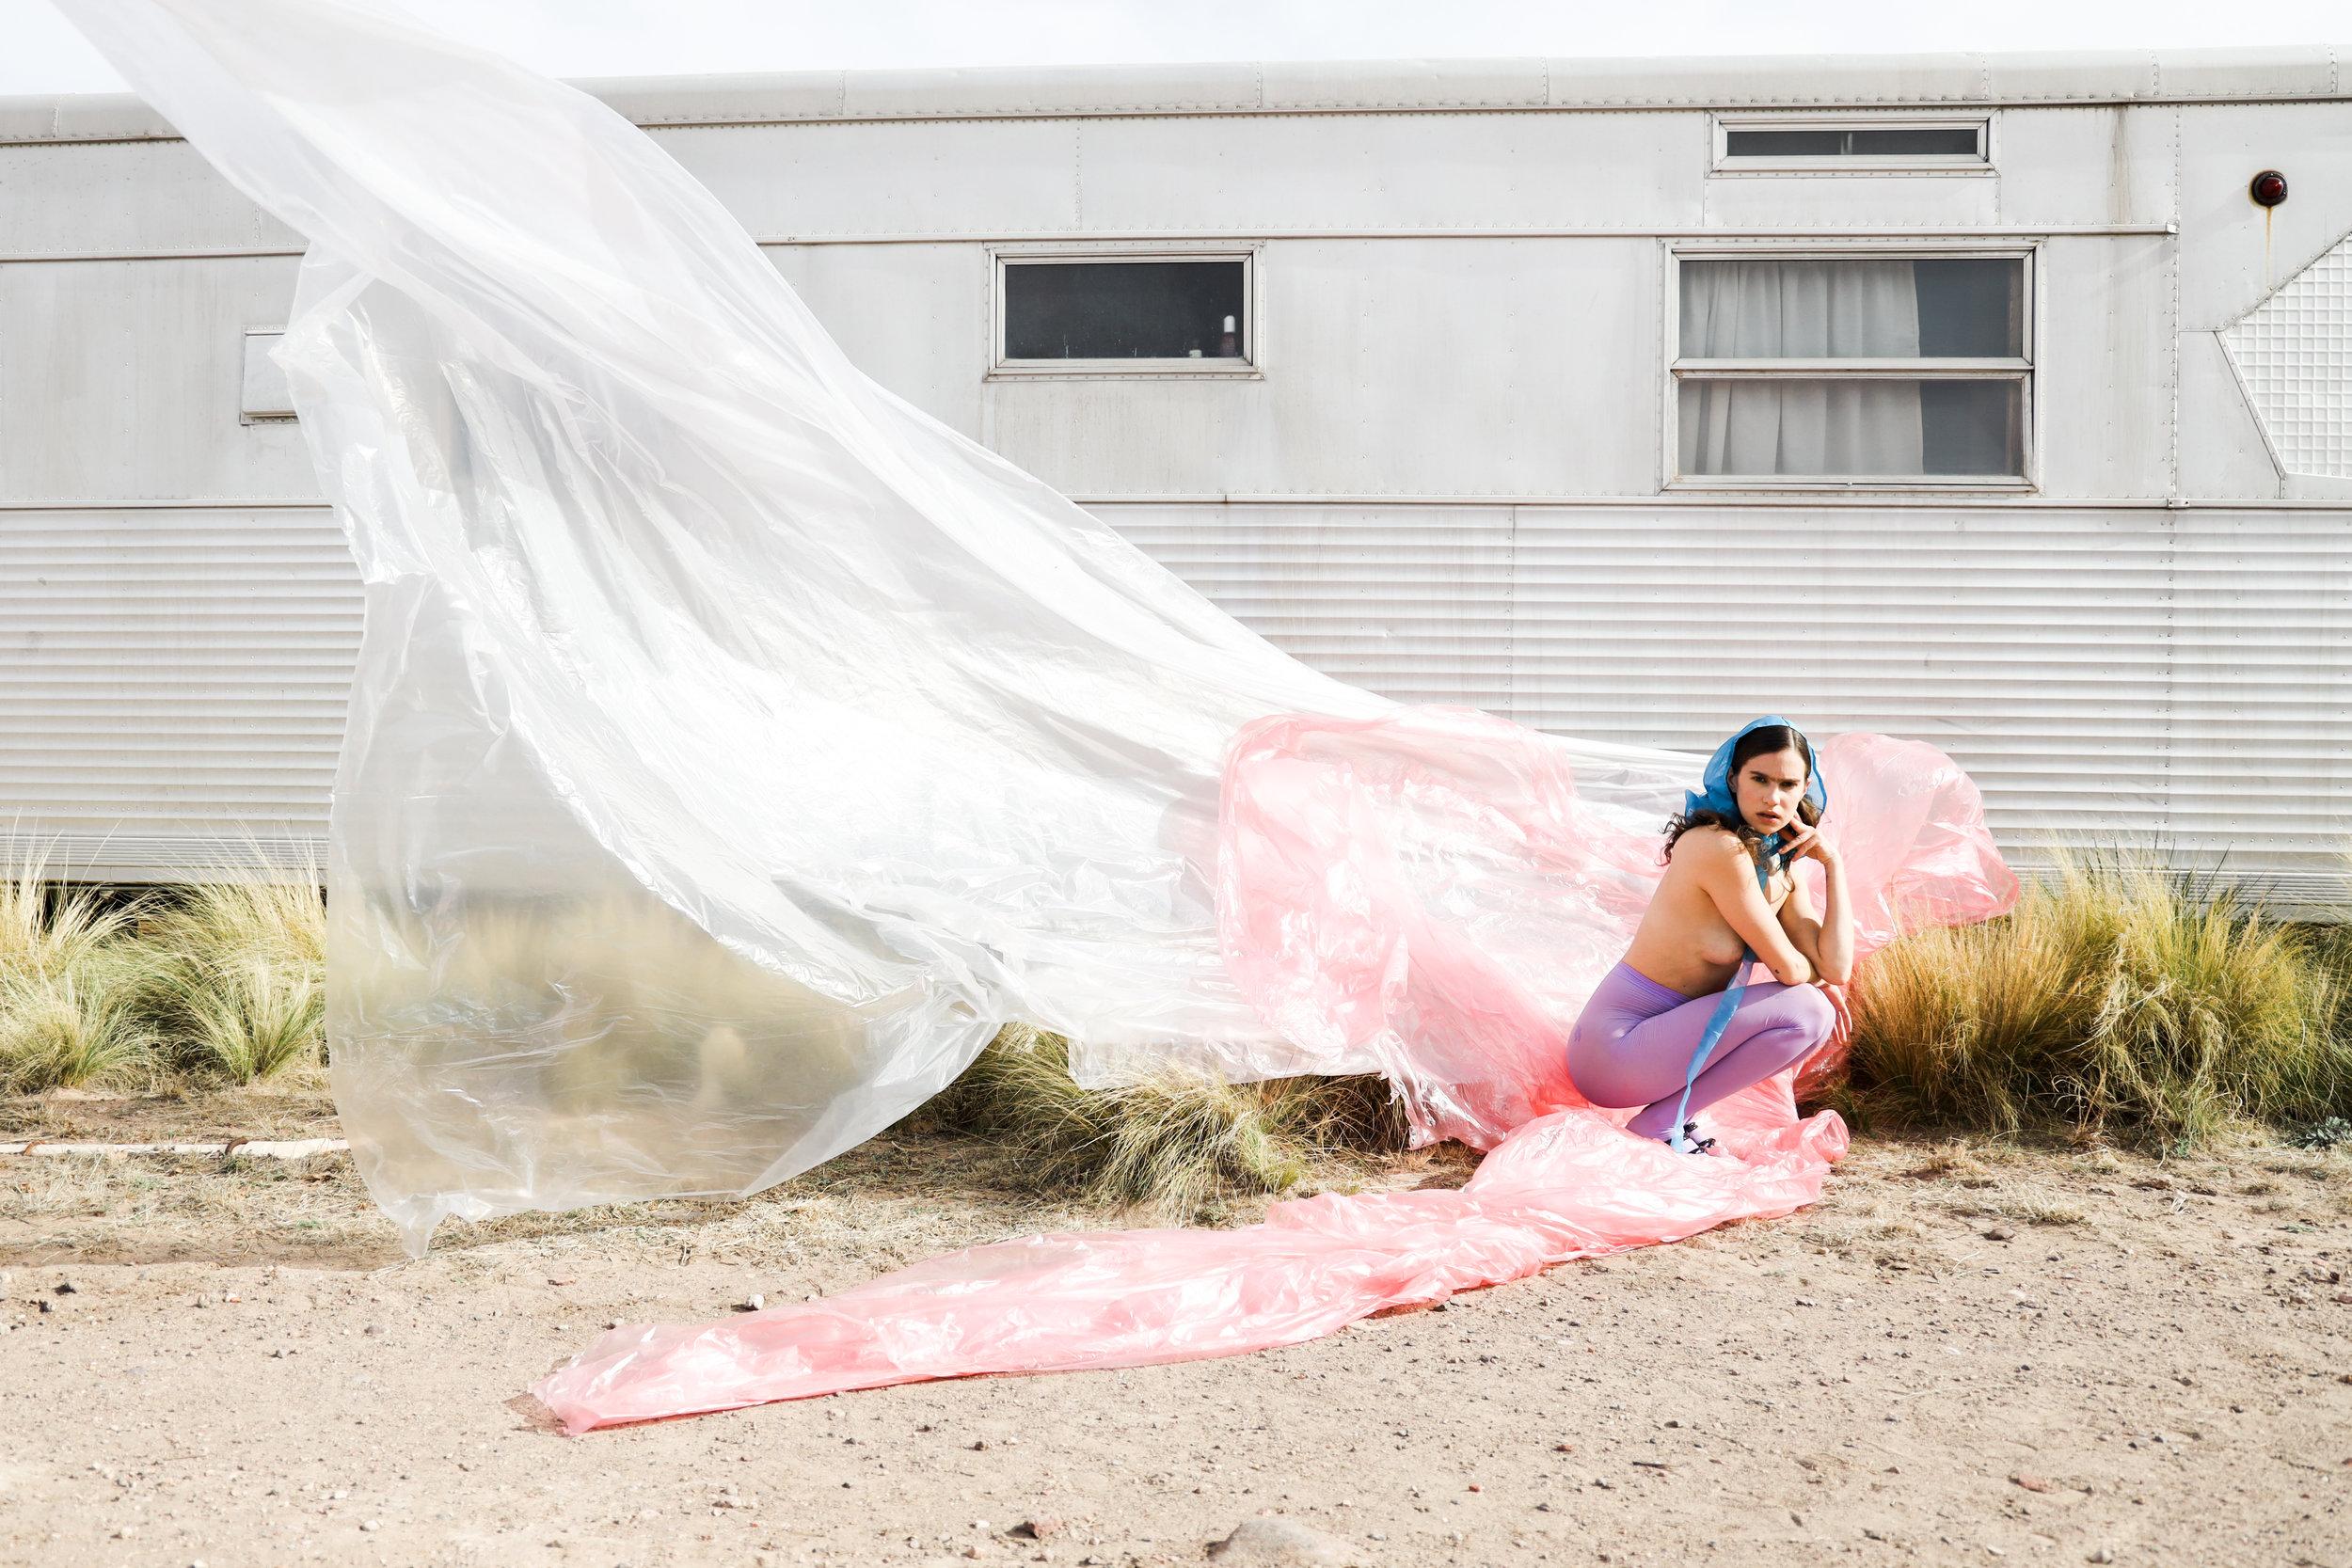 yeah field trip-marfa texas-el cosmico-bare essentials-workshop-nude-portrait-photographer-seattle photographer janelle elaine-19.jpg